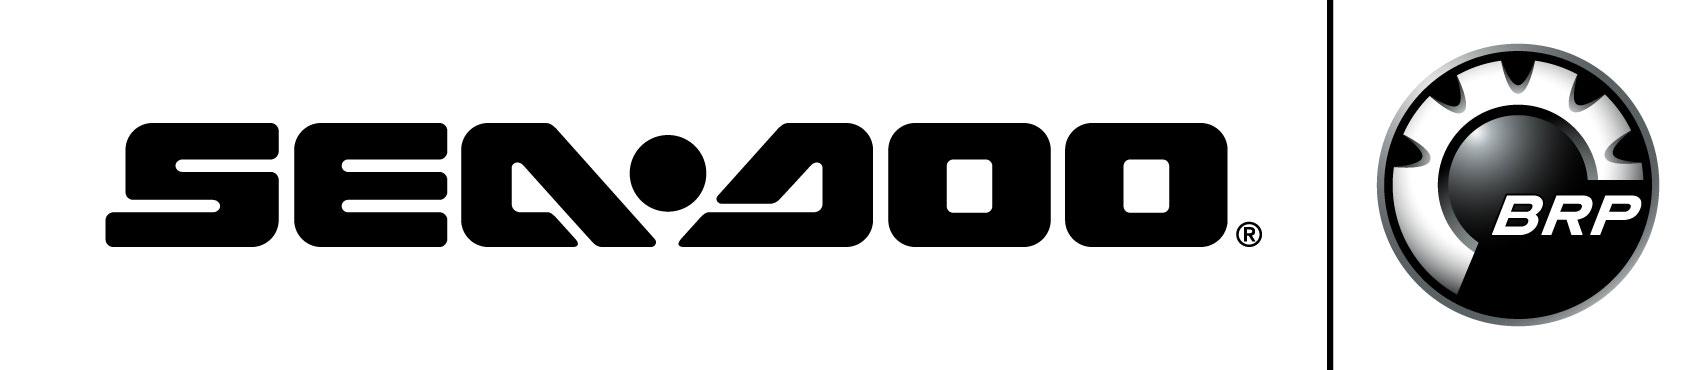 Sea Doo 2011 Wake Pro 215 Engine Hull and Components